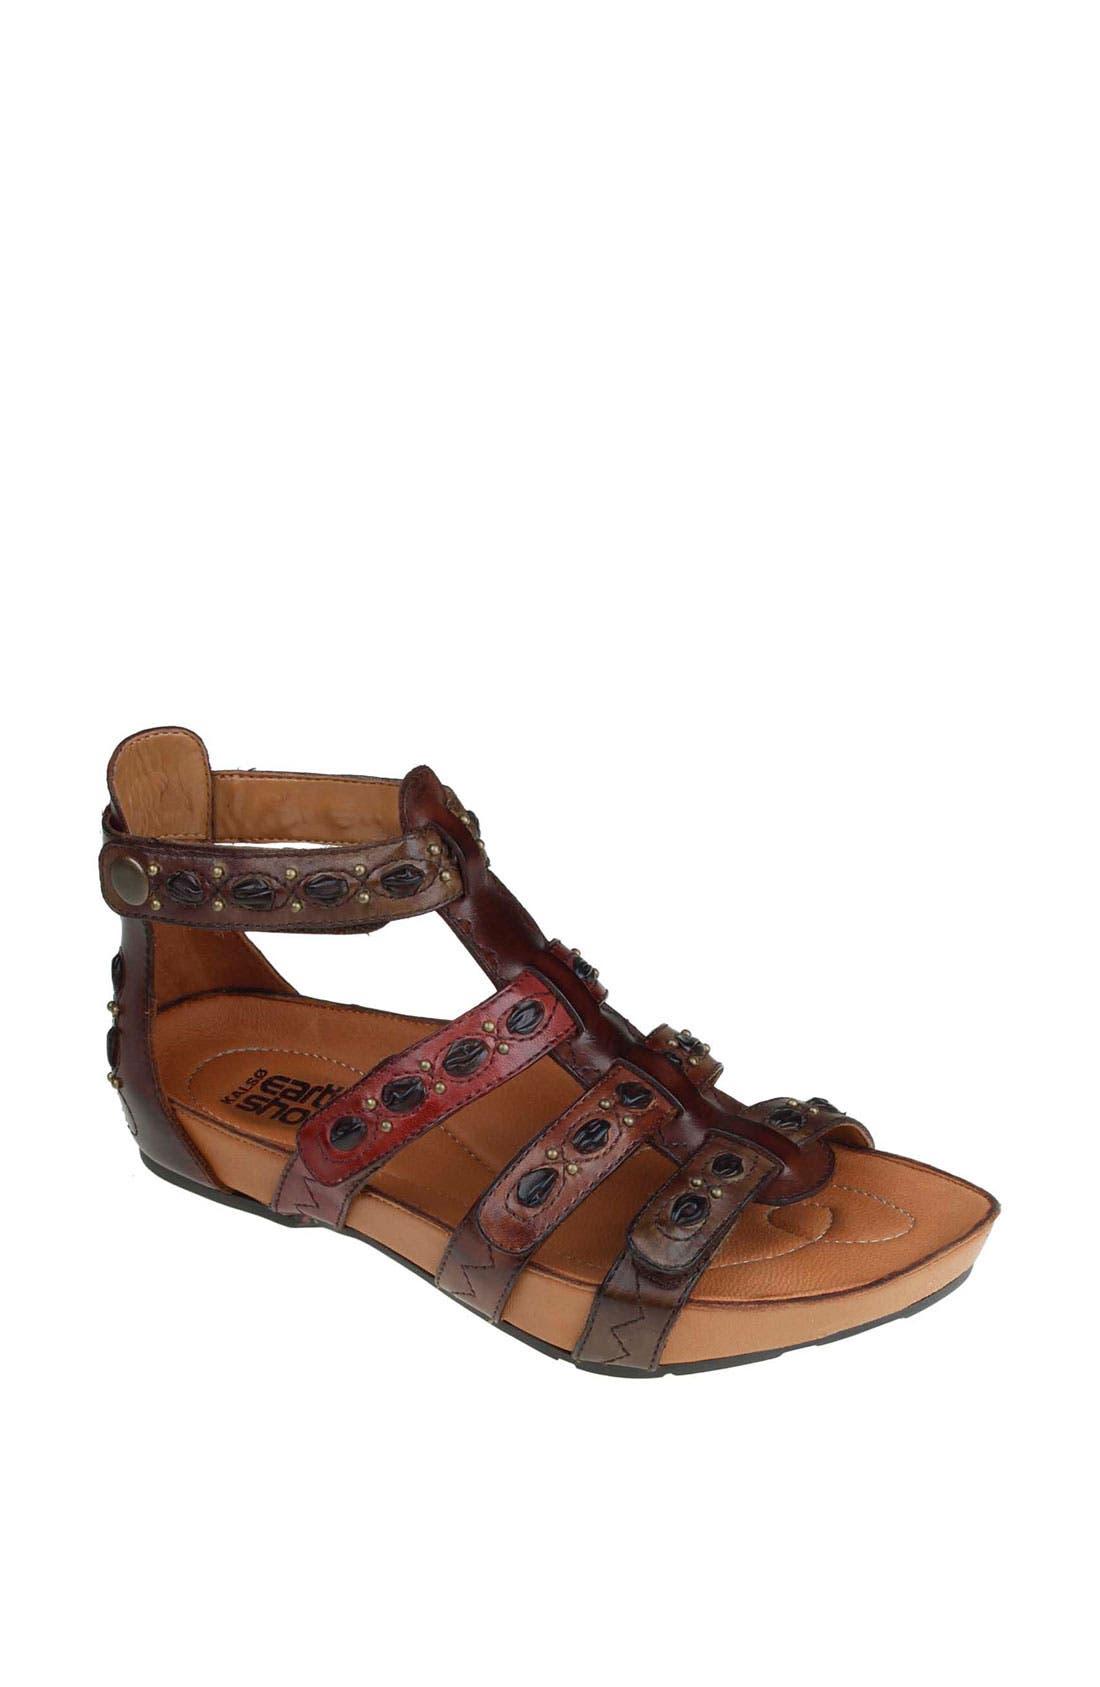 Alternate Image 1 Selected - Kalso Earth® 'Empire' Sandal